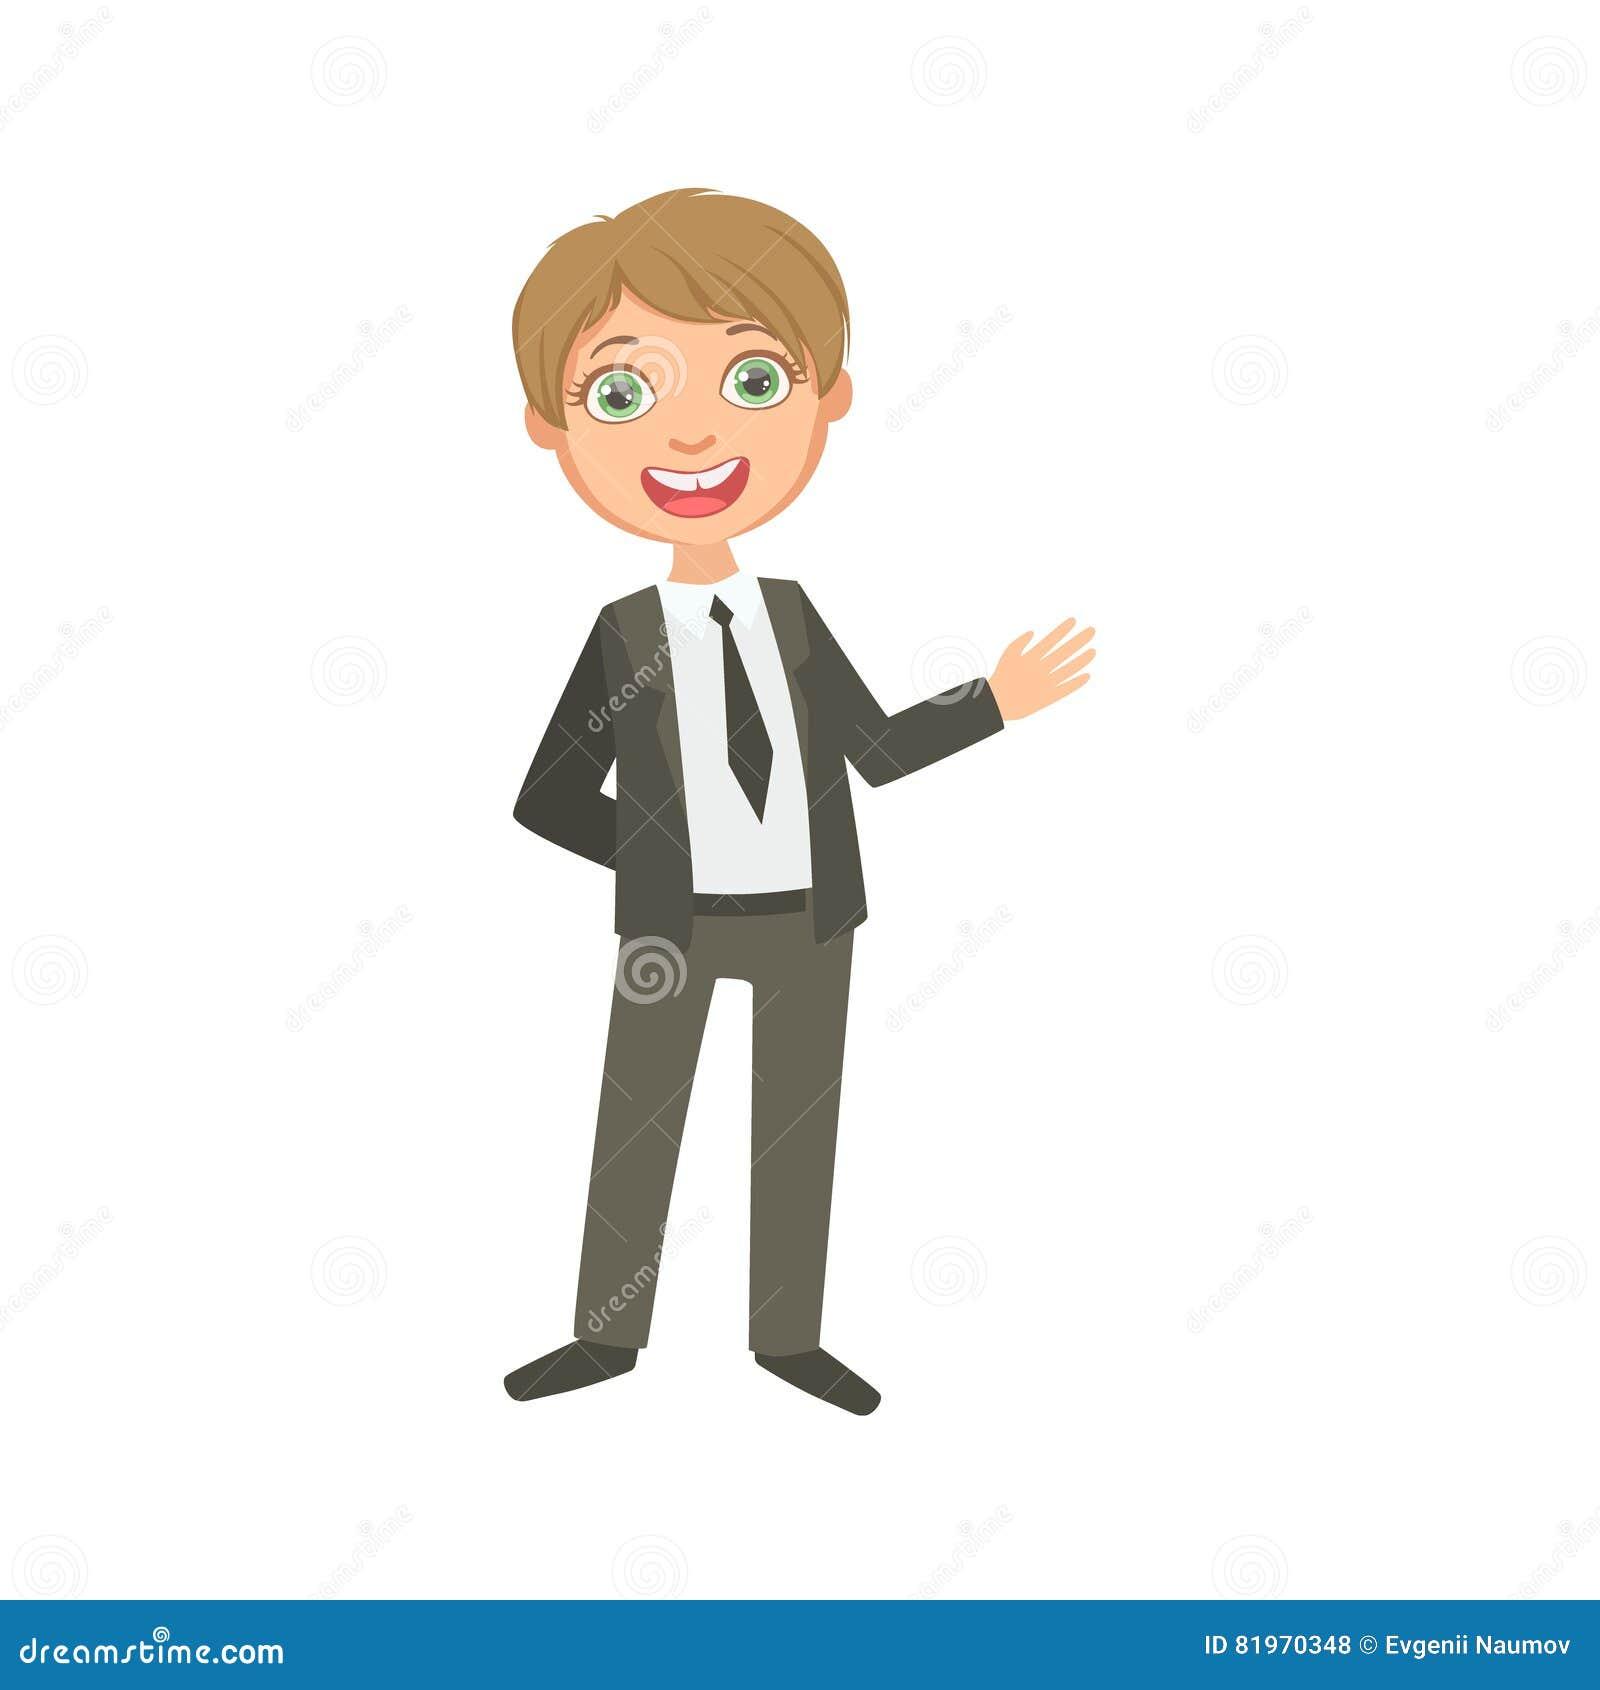 Cartoon Characters In Suits : Happy school boy cartoon royalty free stock photography